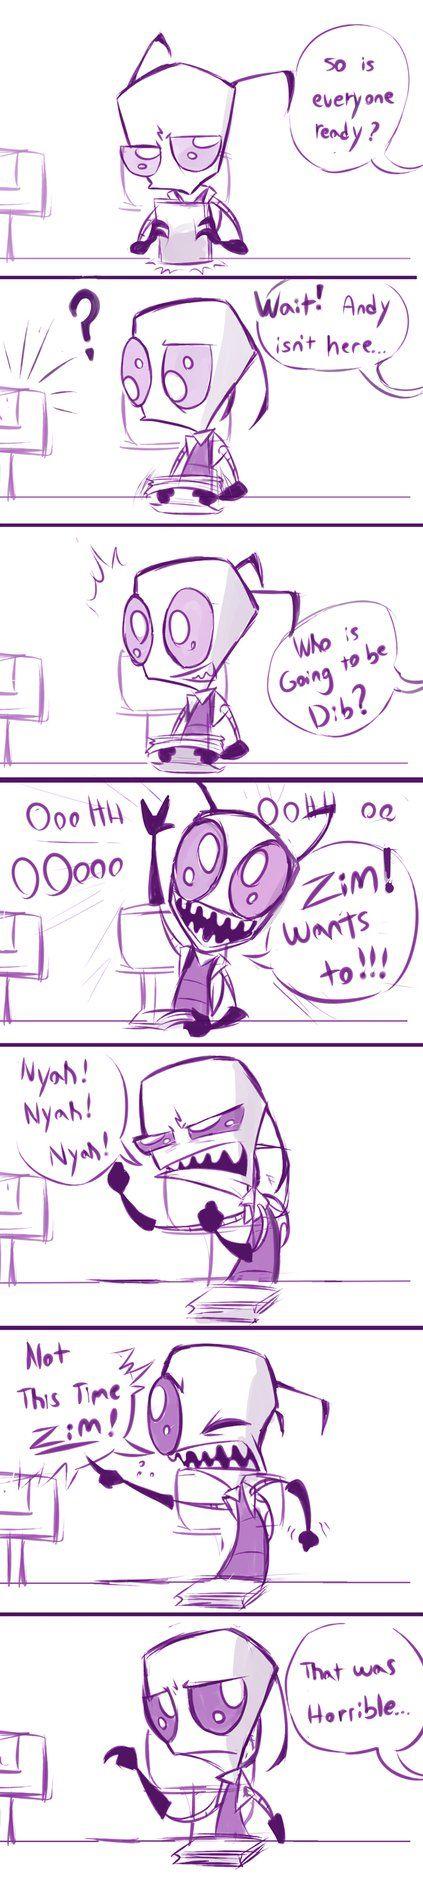 Zim! wants to be the big head by VengefulSpirits on DeviantArt